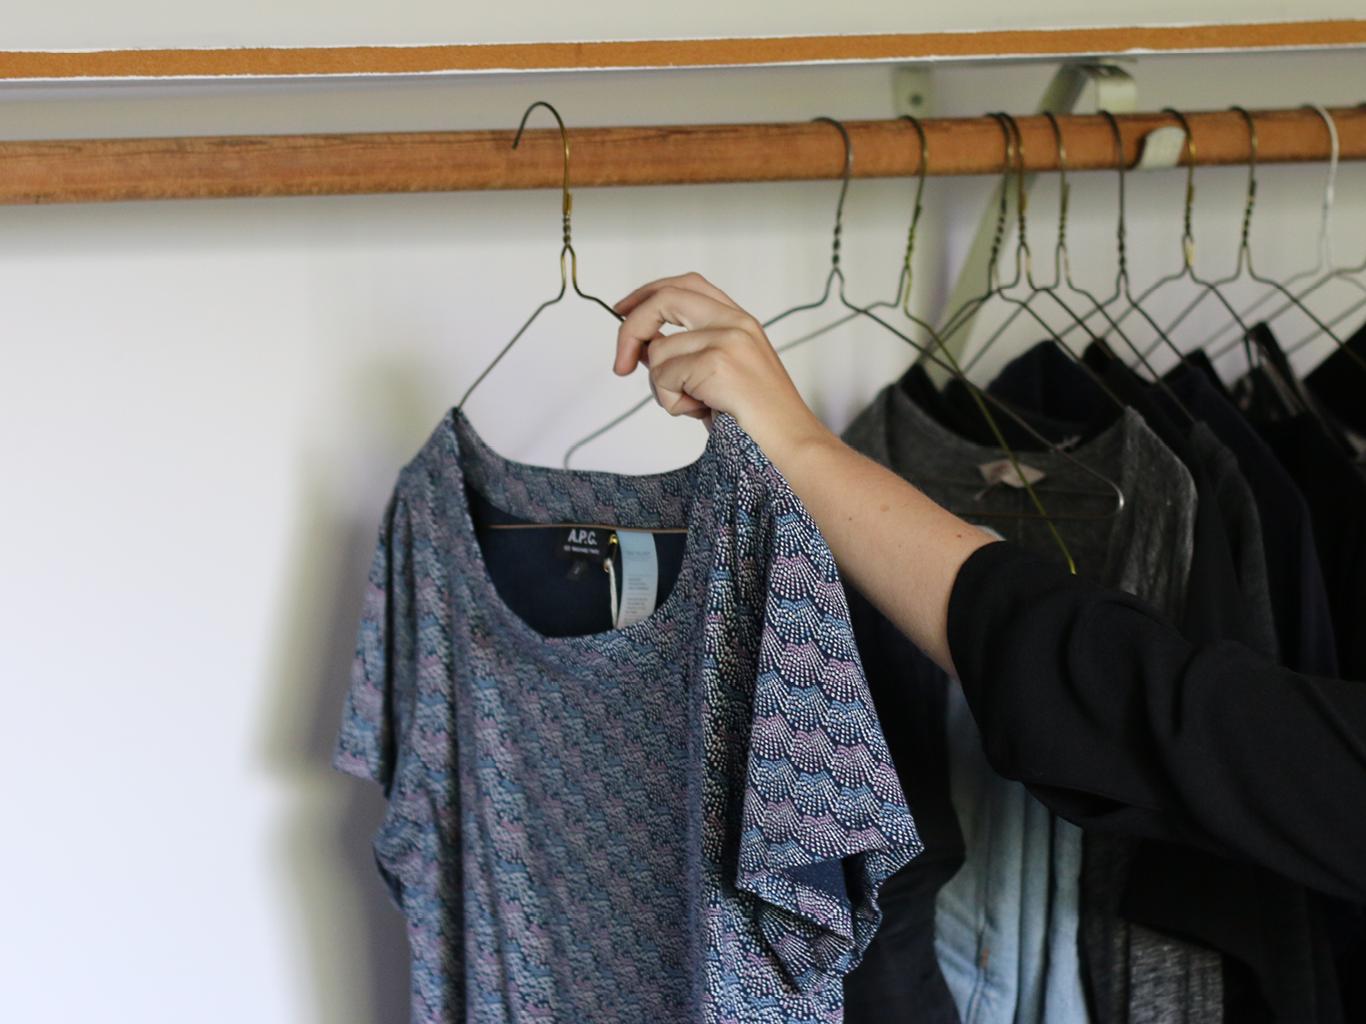 Adds garment to wardrobe